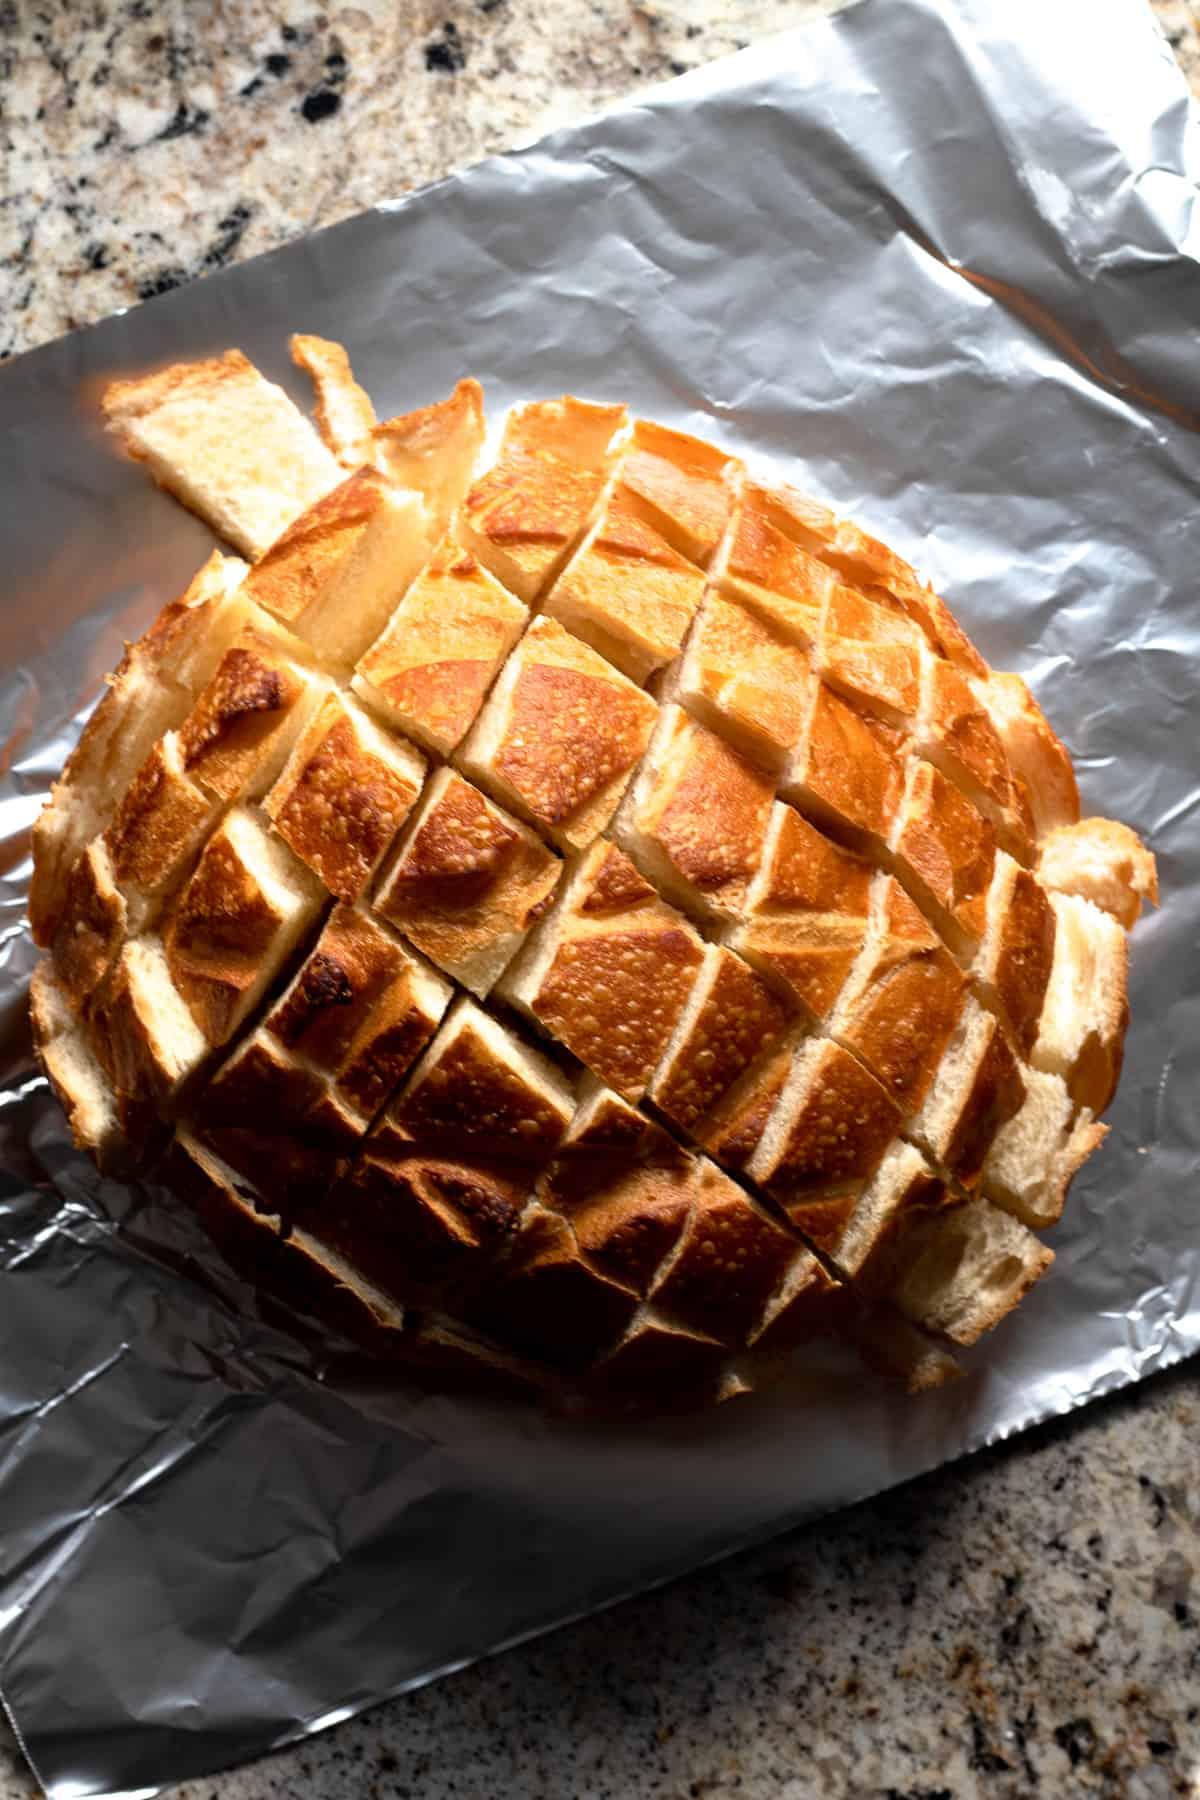 Vegan Sourdough Loaf on Tin Foil Sliced into InTact Cubes